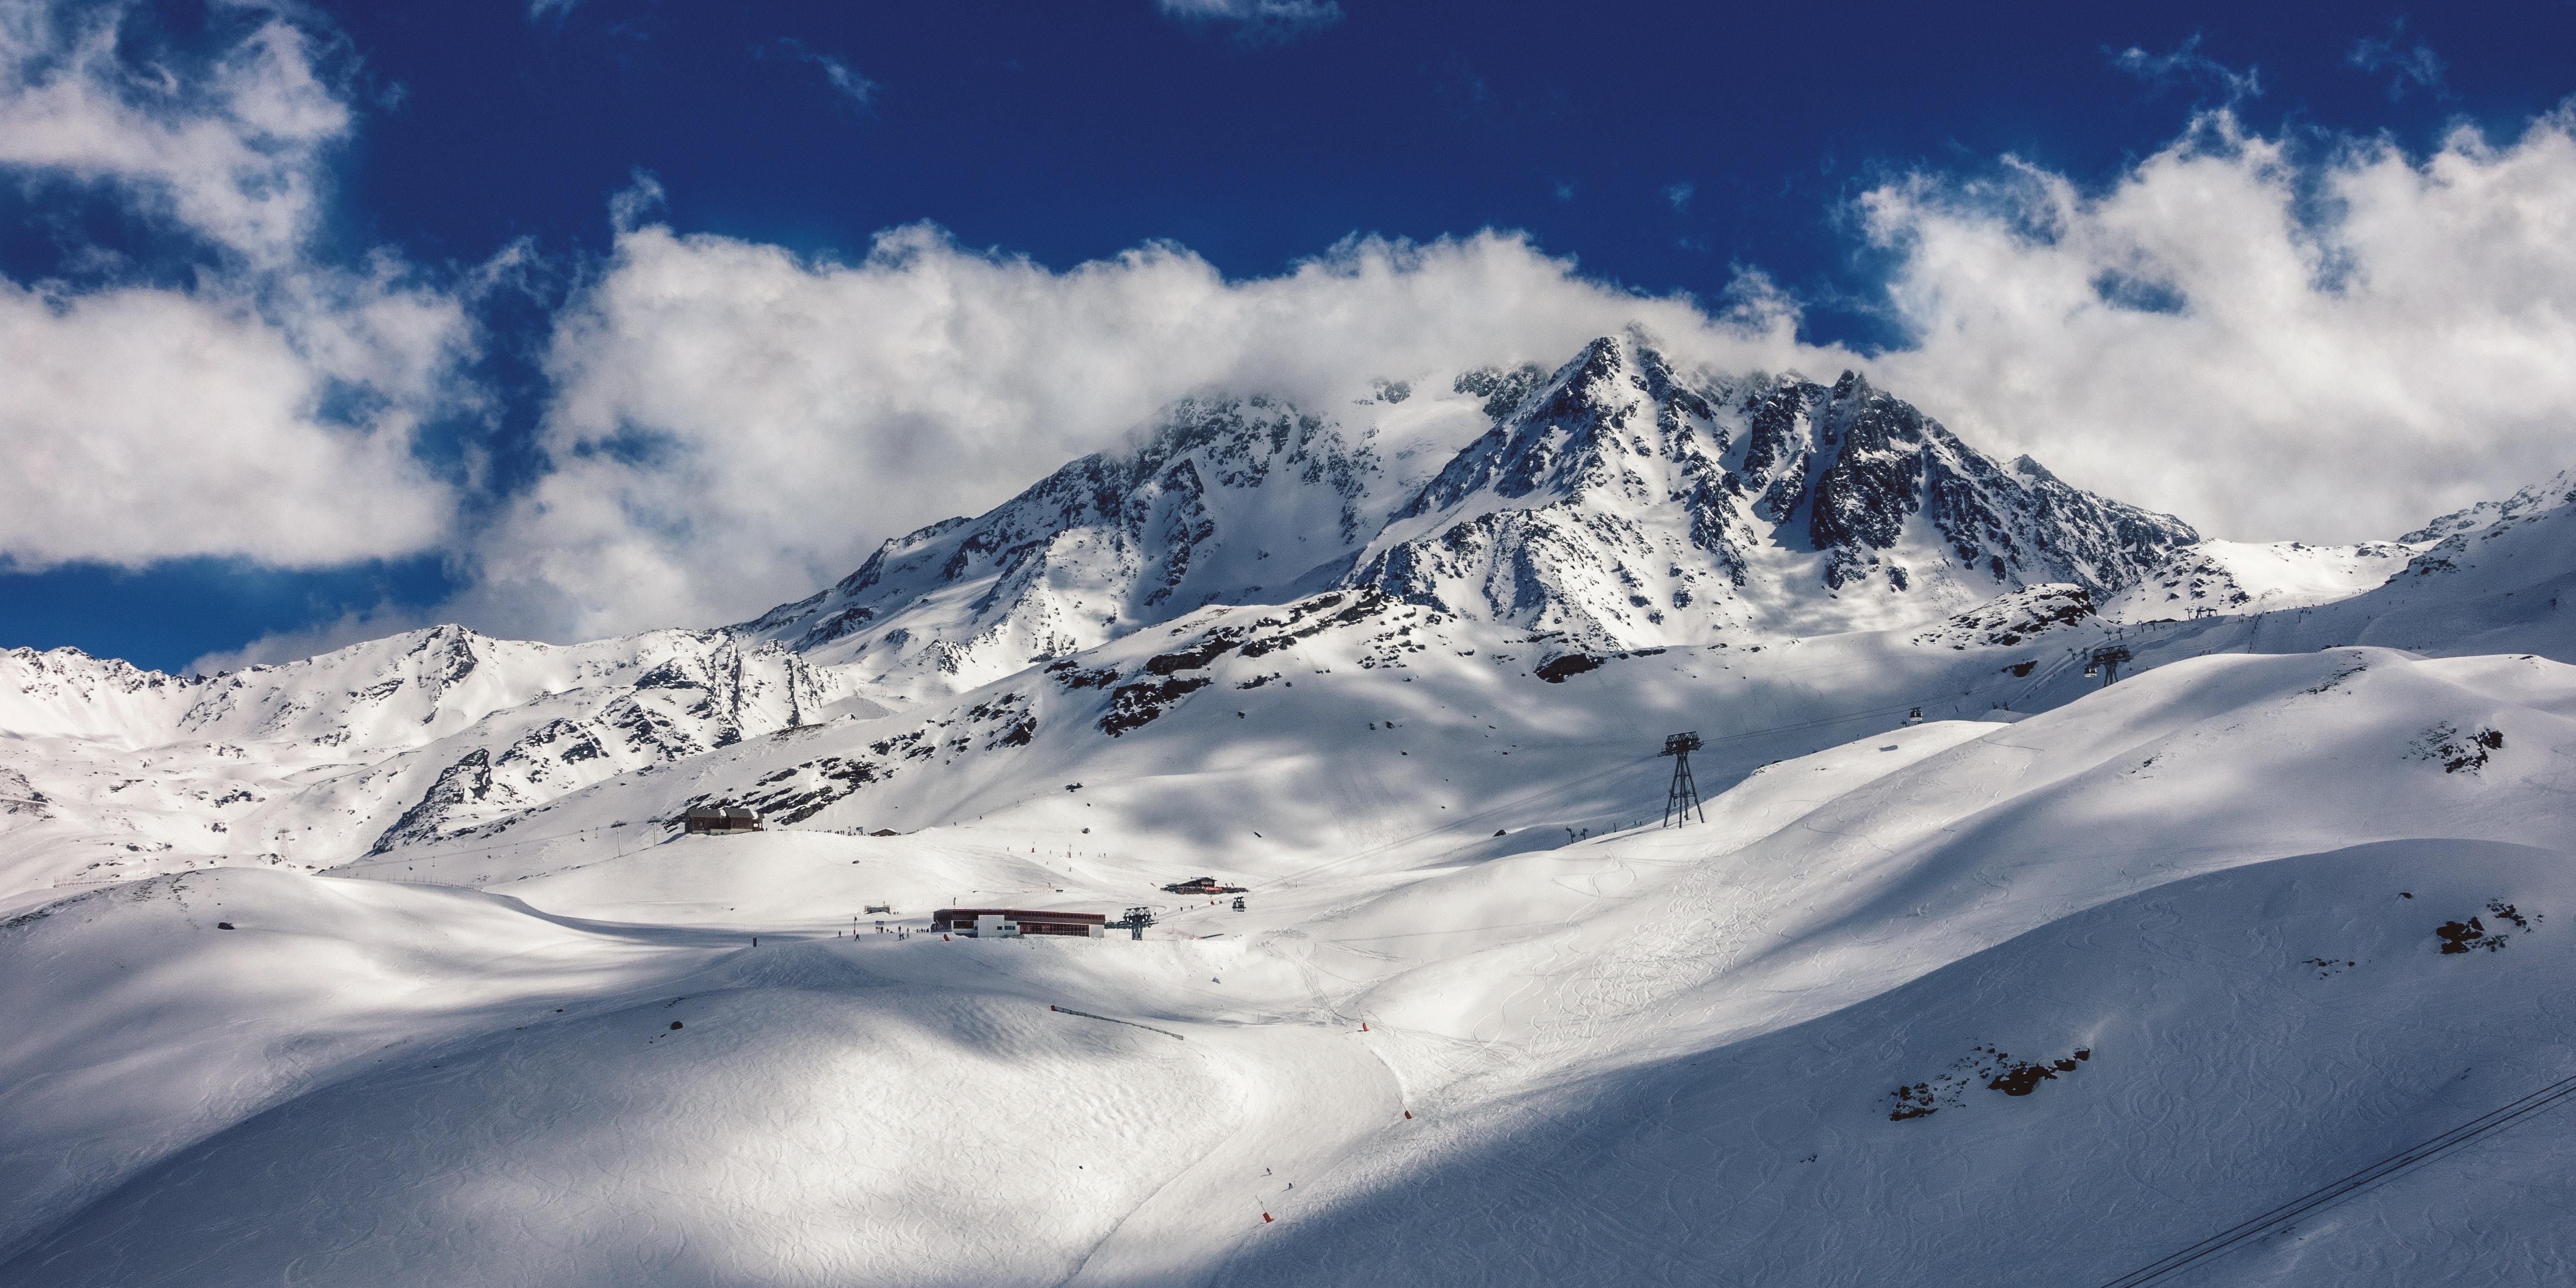 Snow Cap Mountain, Clouds, Cold, Ice, Landscape, HQ Photo